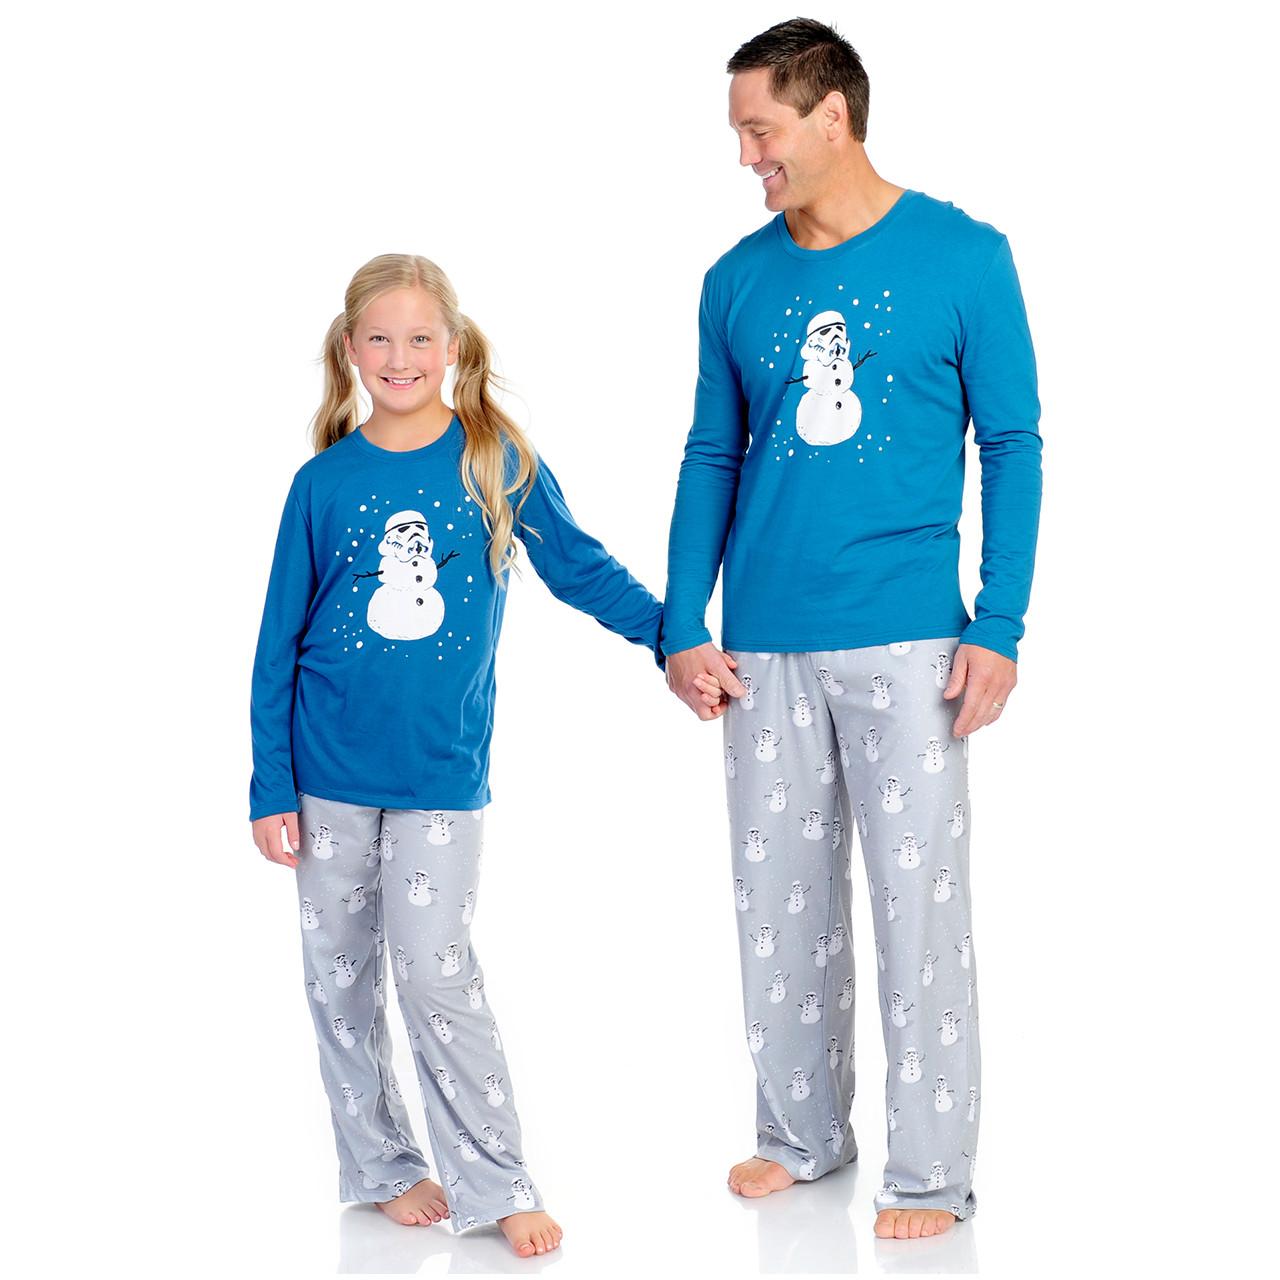 aad128413047 Stormtrooper Snowman Men s Long Sleeve and Pant PJ Set - Munki Munki